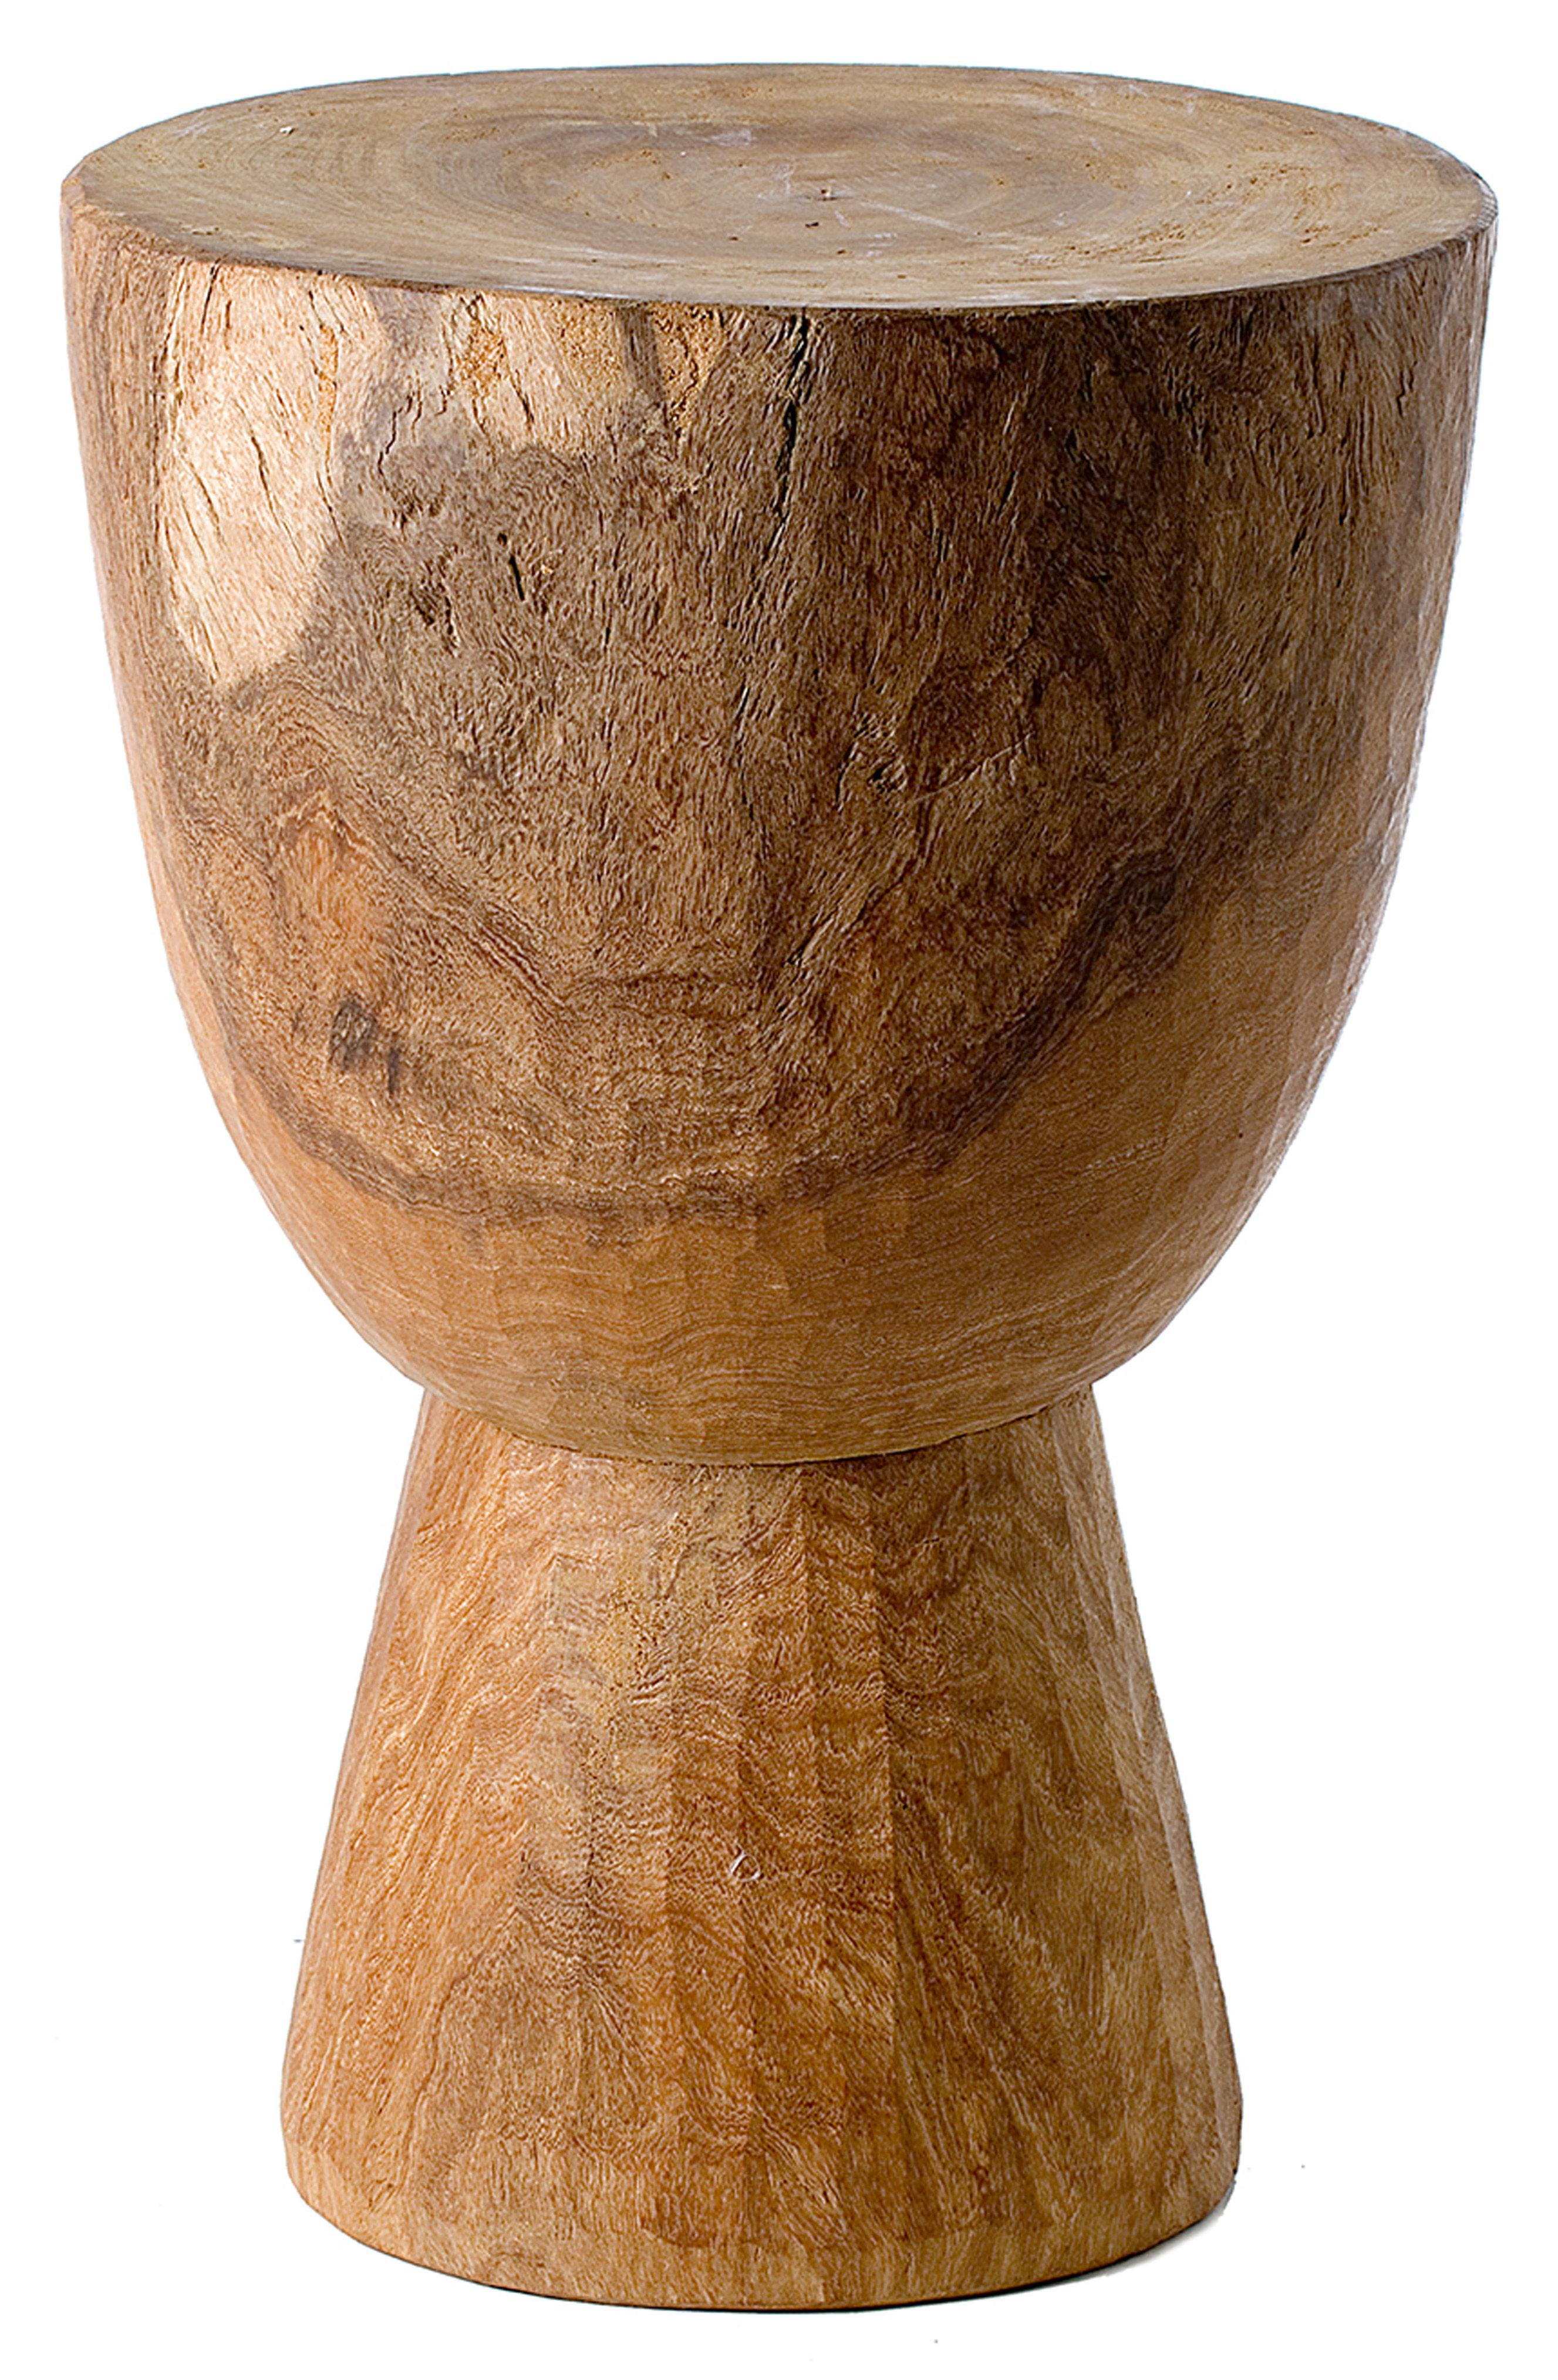 Möbel - Couchtische - Stool Tam Tam Hocker Hocker/Tisch - Pols Potten - Holz - Holz